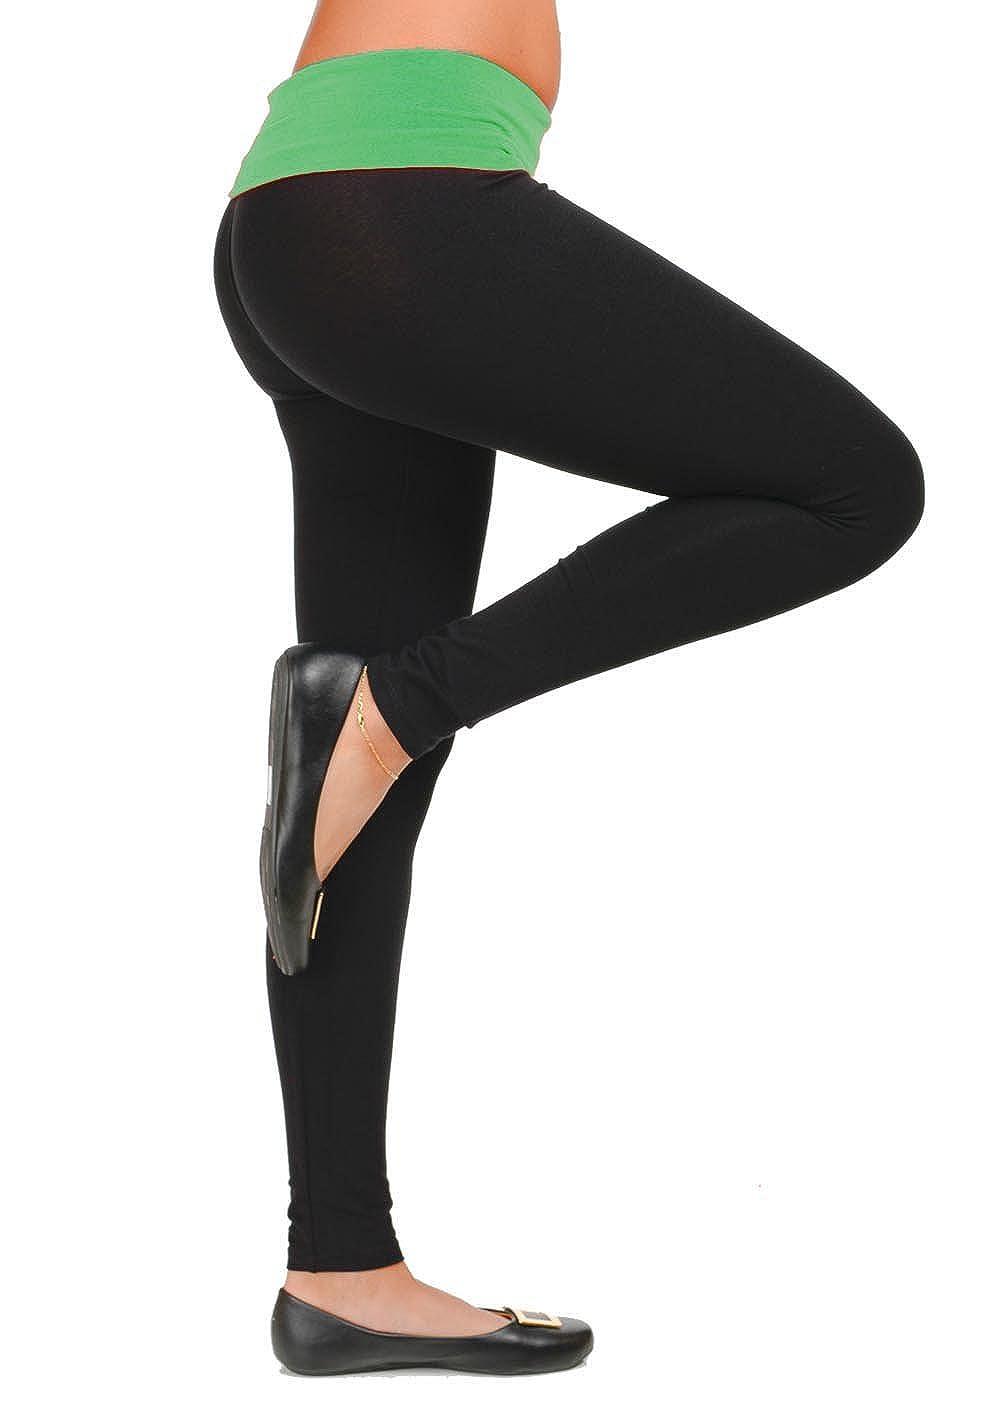 Hollywood Star Fashion Ladies Printed Tight Fit Yoga Pants Foldover Leggings